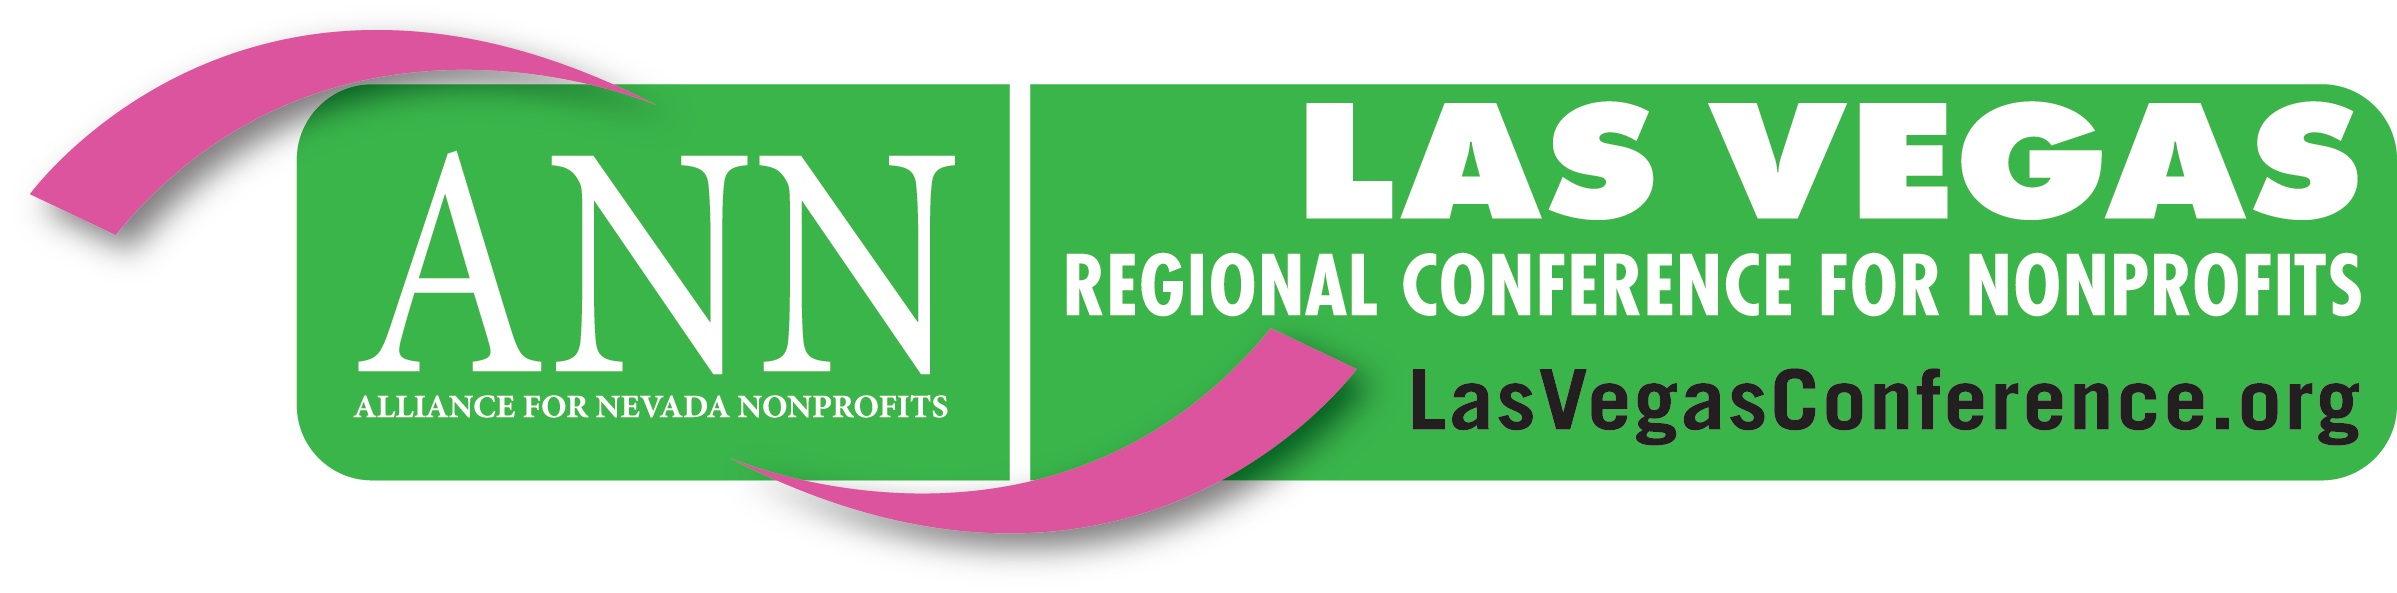 ANN Reno Regional Conference for Nonprofits